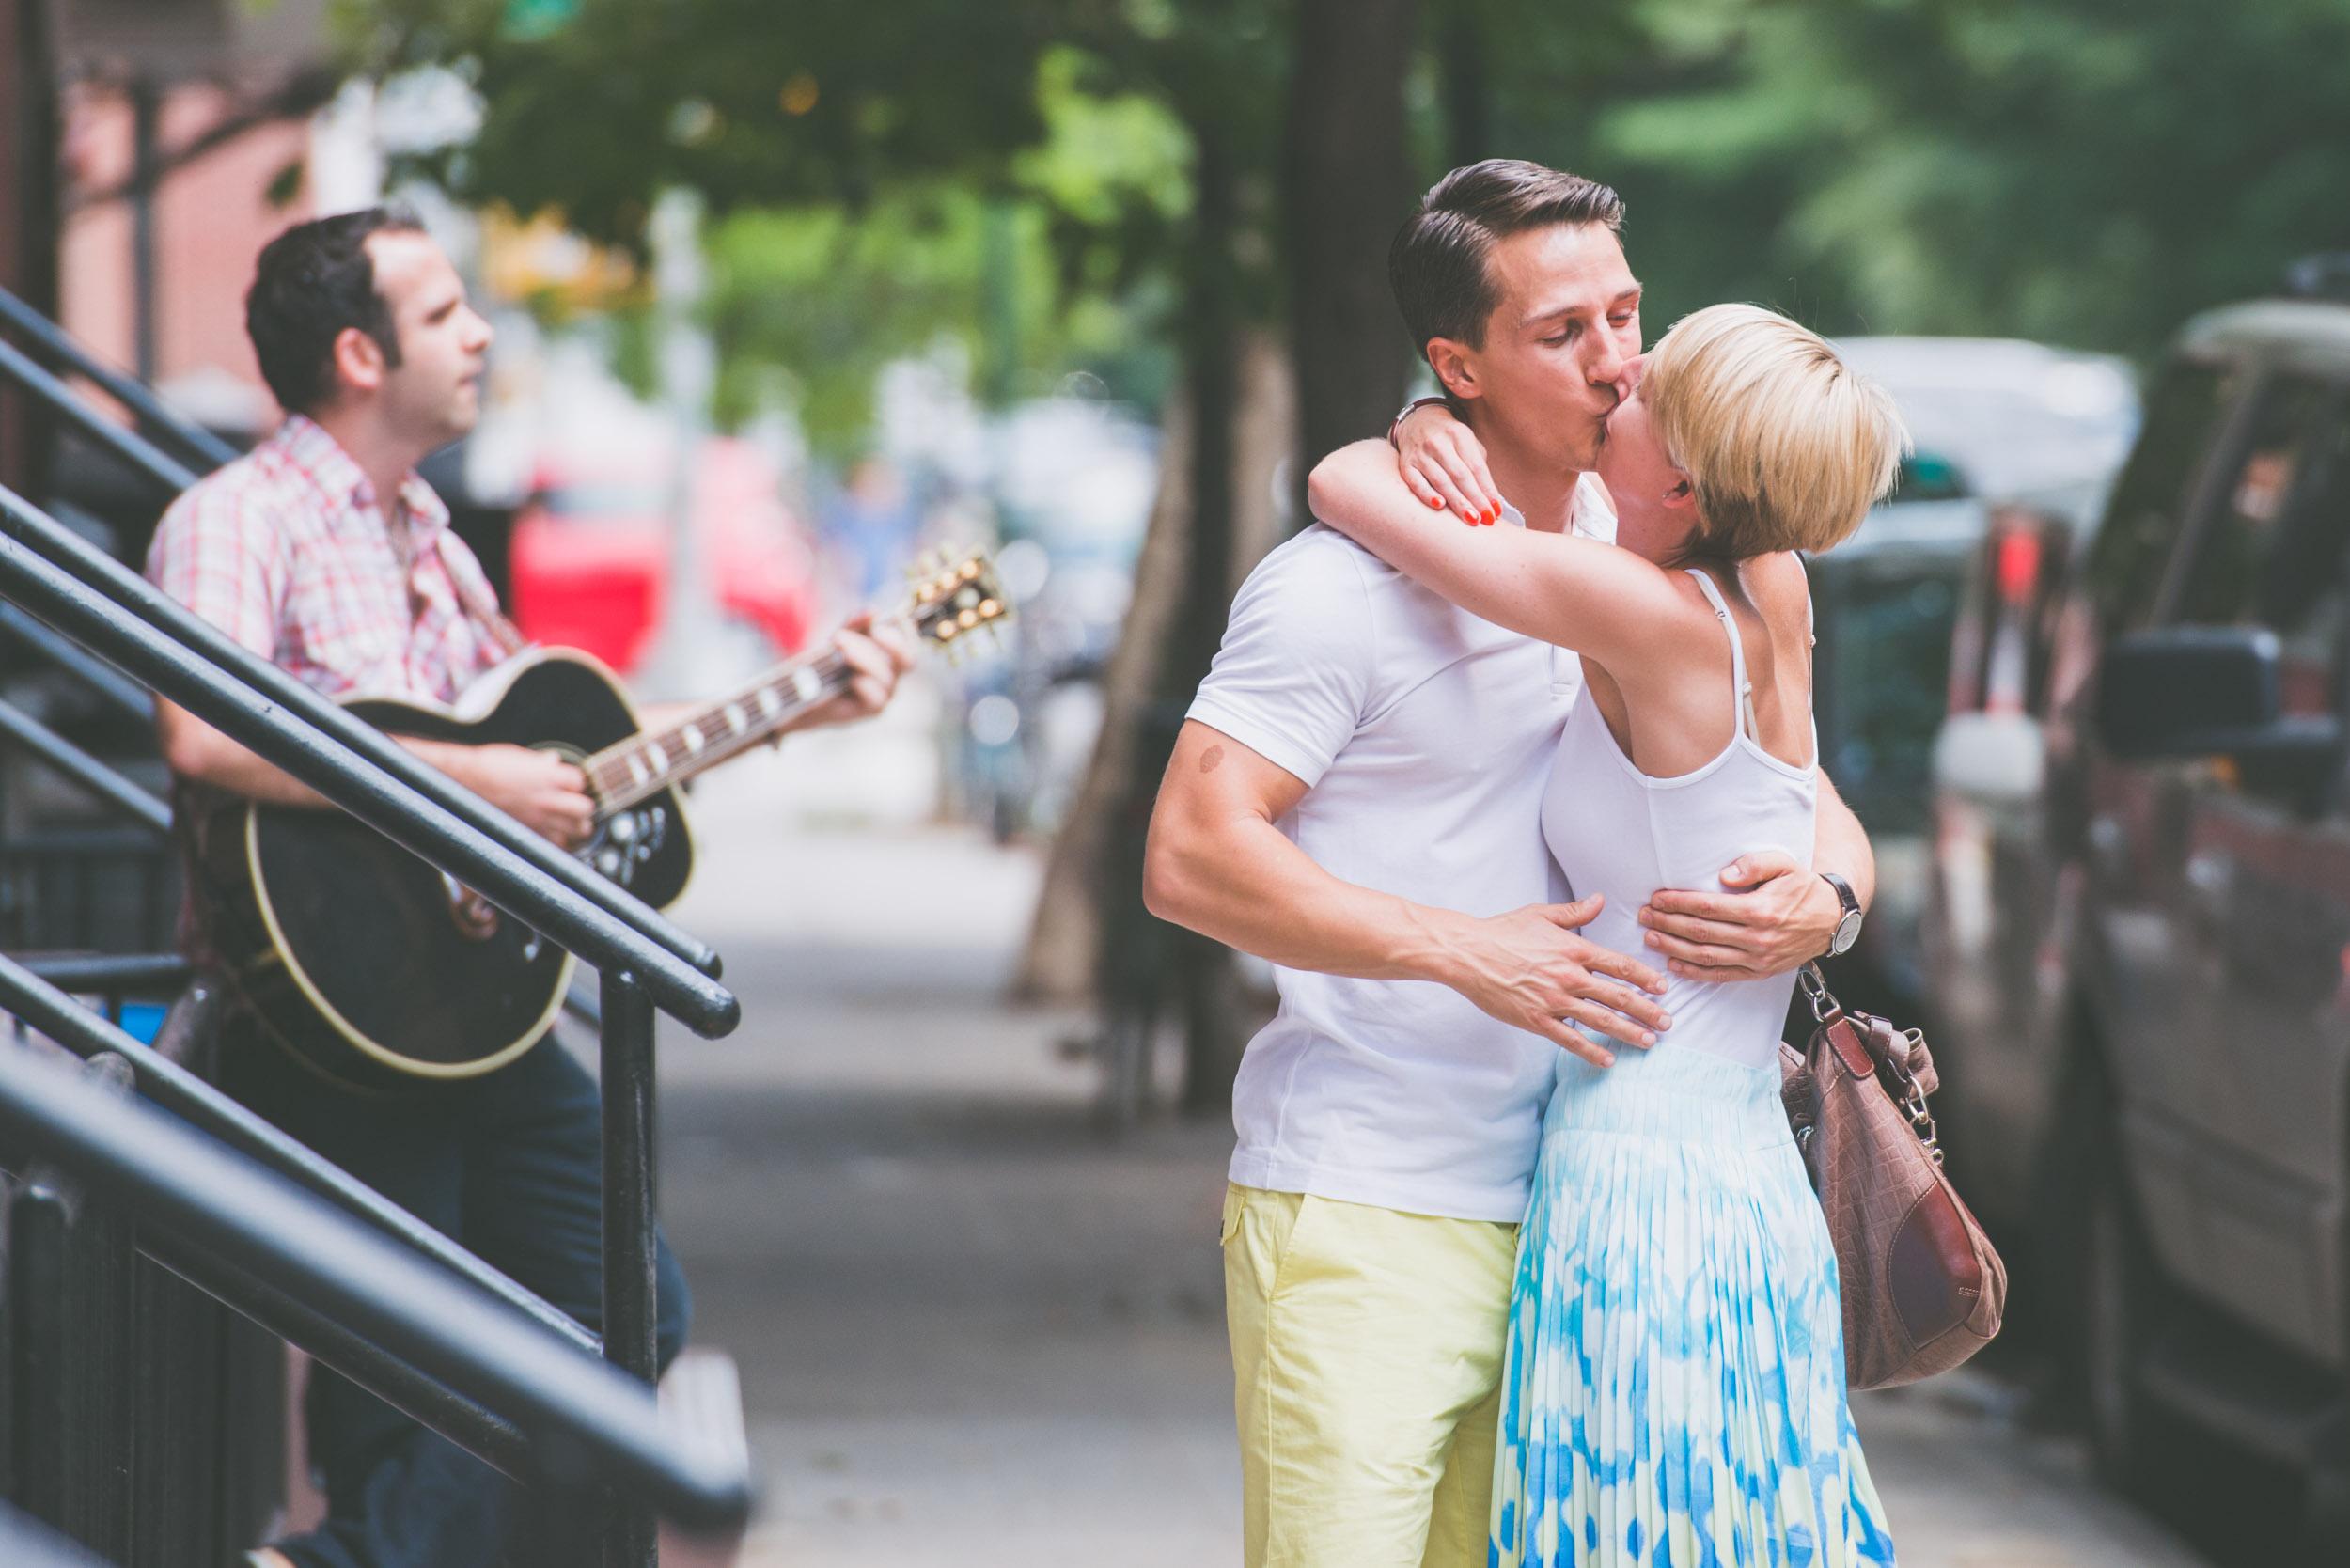 Couple kissing near guitar player - Engagement Portraits - Photo credit Nicola Bailey.jpg